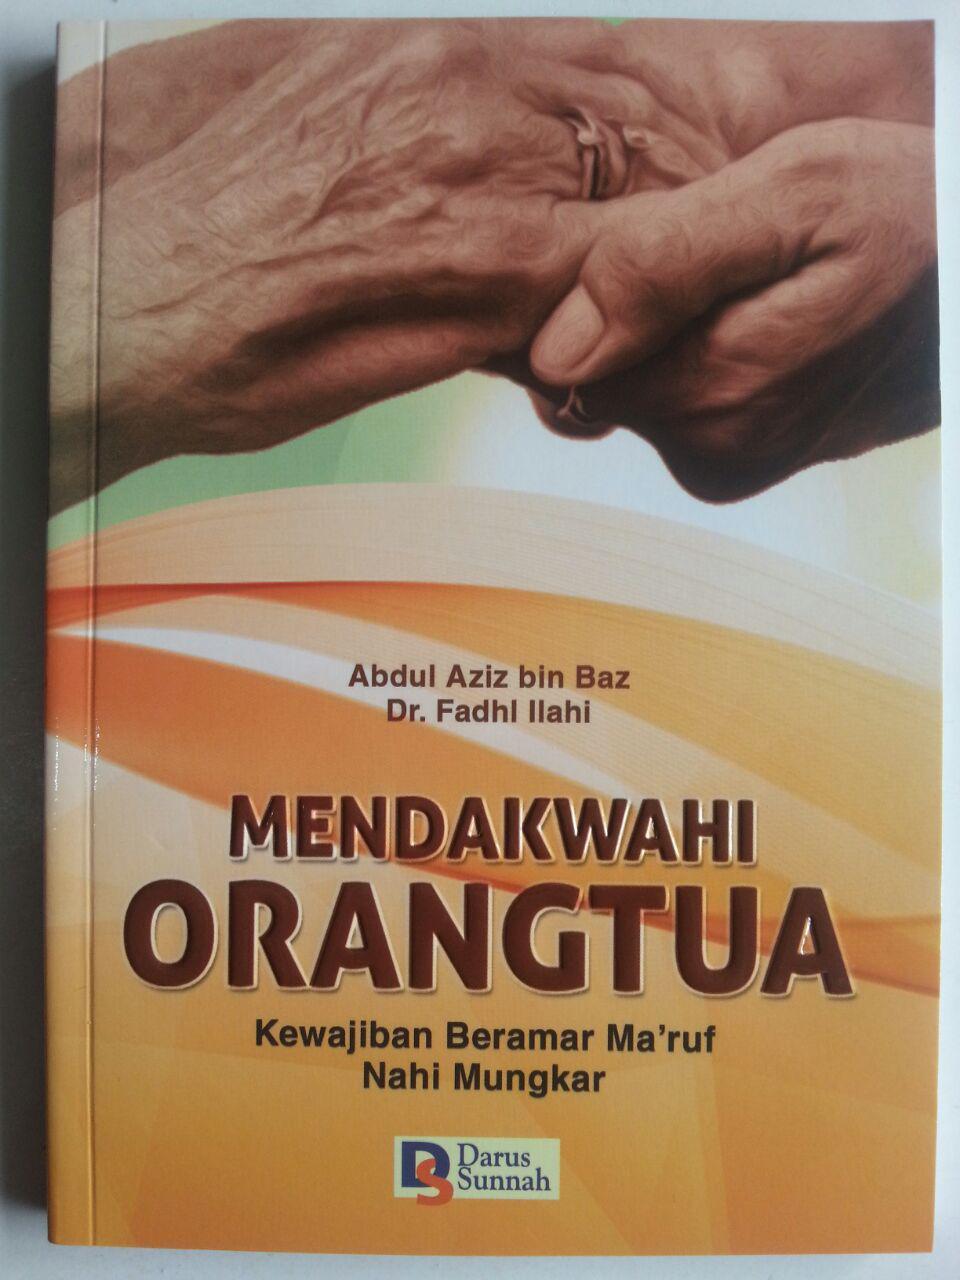 Buku Mendakwahi Orang Tua Kewajiban Beramar Maruf Nahi Munkar cover 2